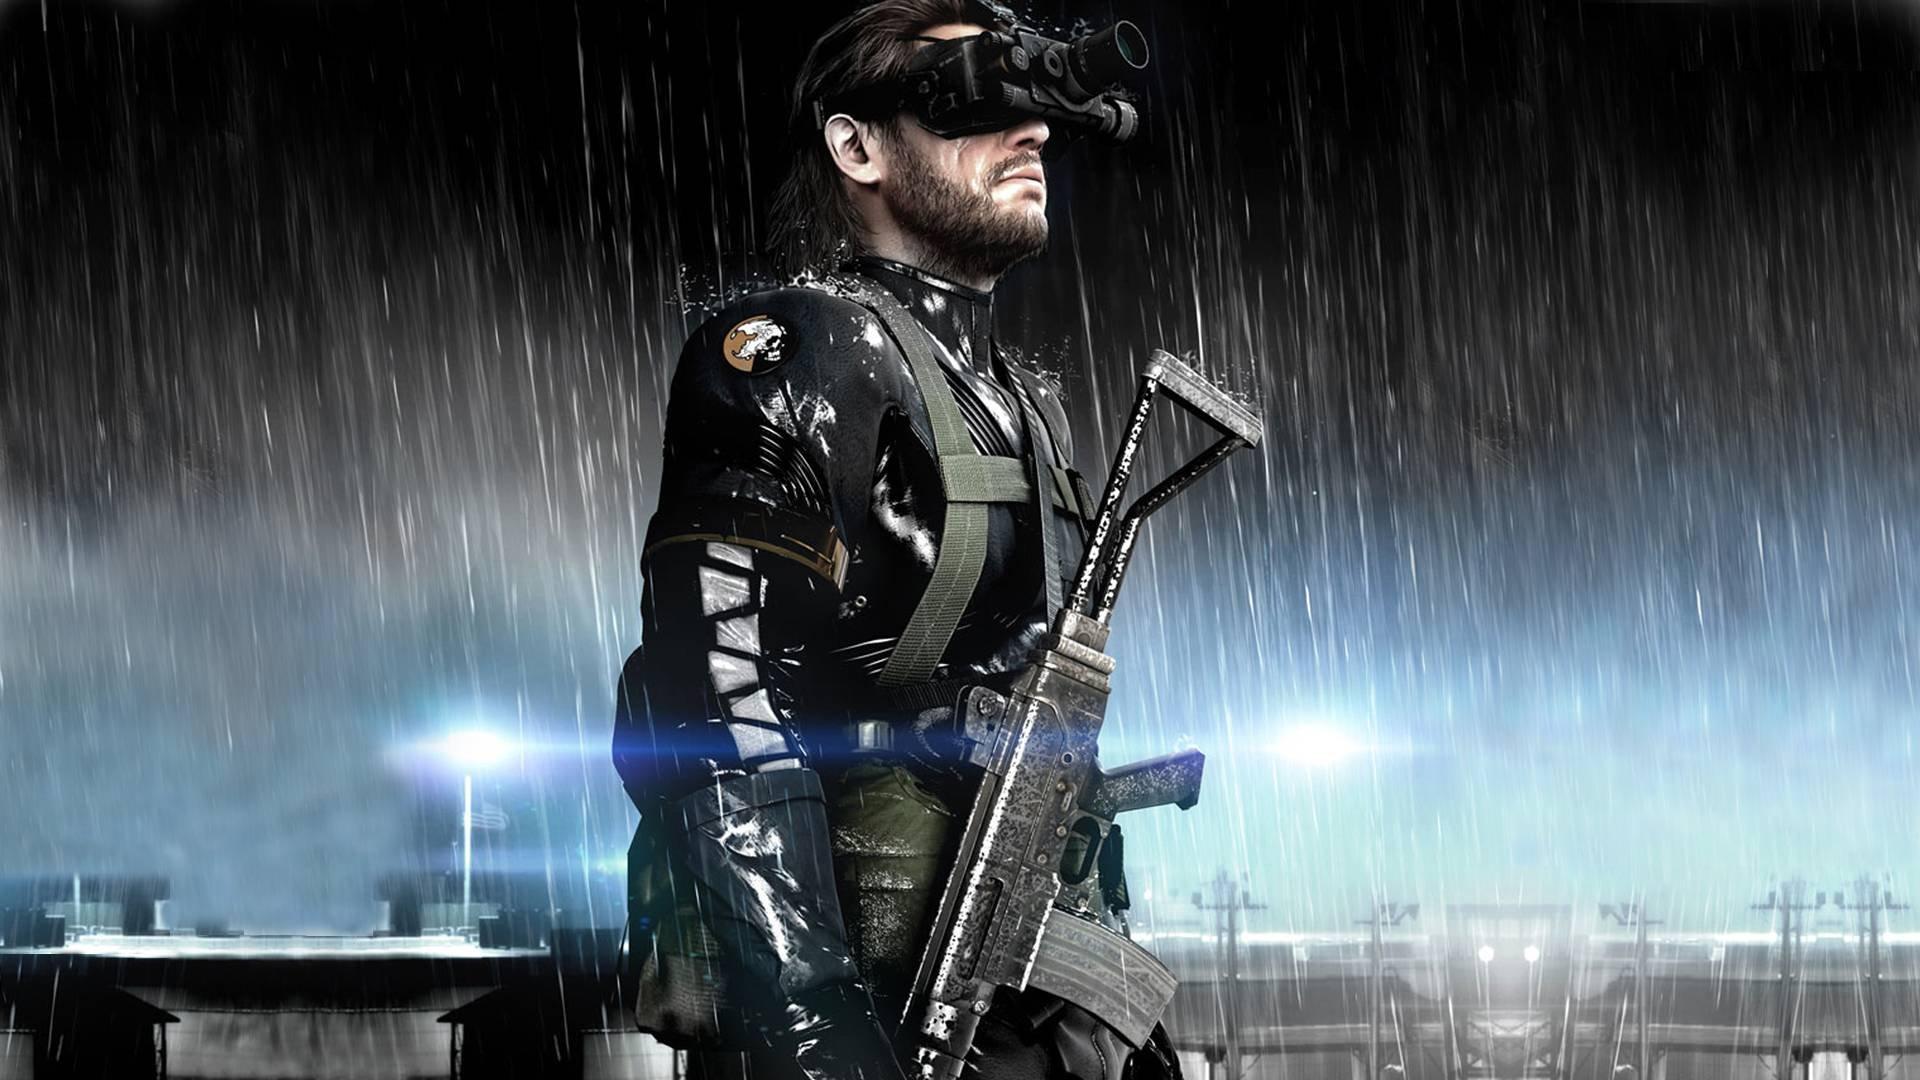 http://loser-city.com/wp-content/uploads/2014/07/Metal-Gear-Solid-V.jpg